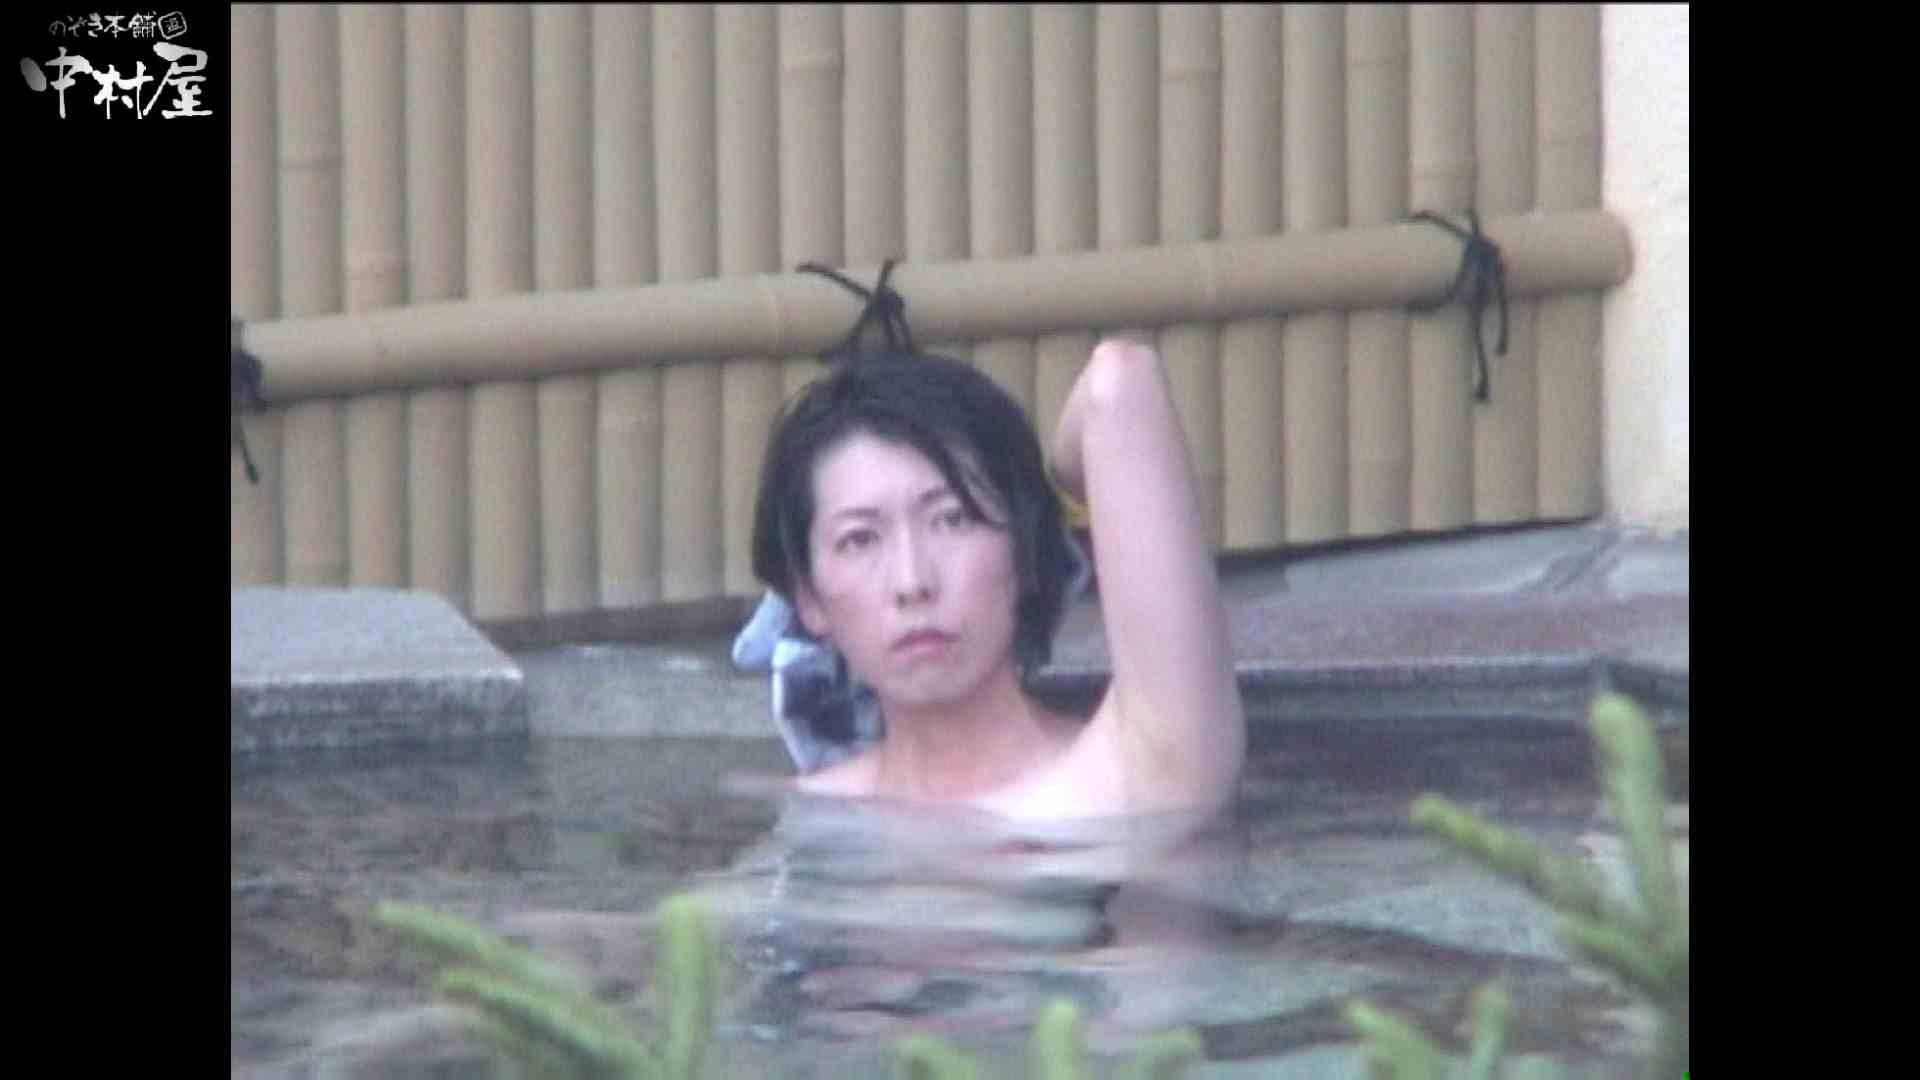 Aquaな露天風呂Vol.987 露天 オマンコ無修正動画無料 71画像 8